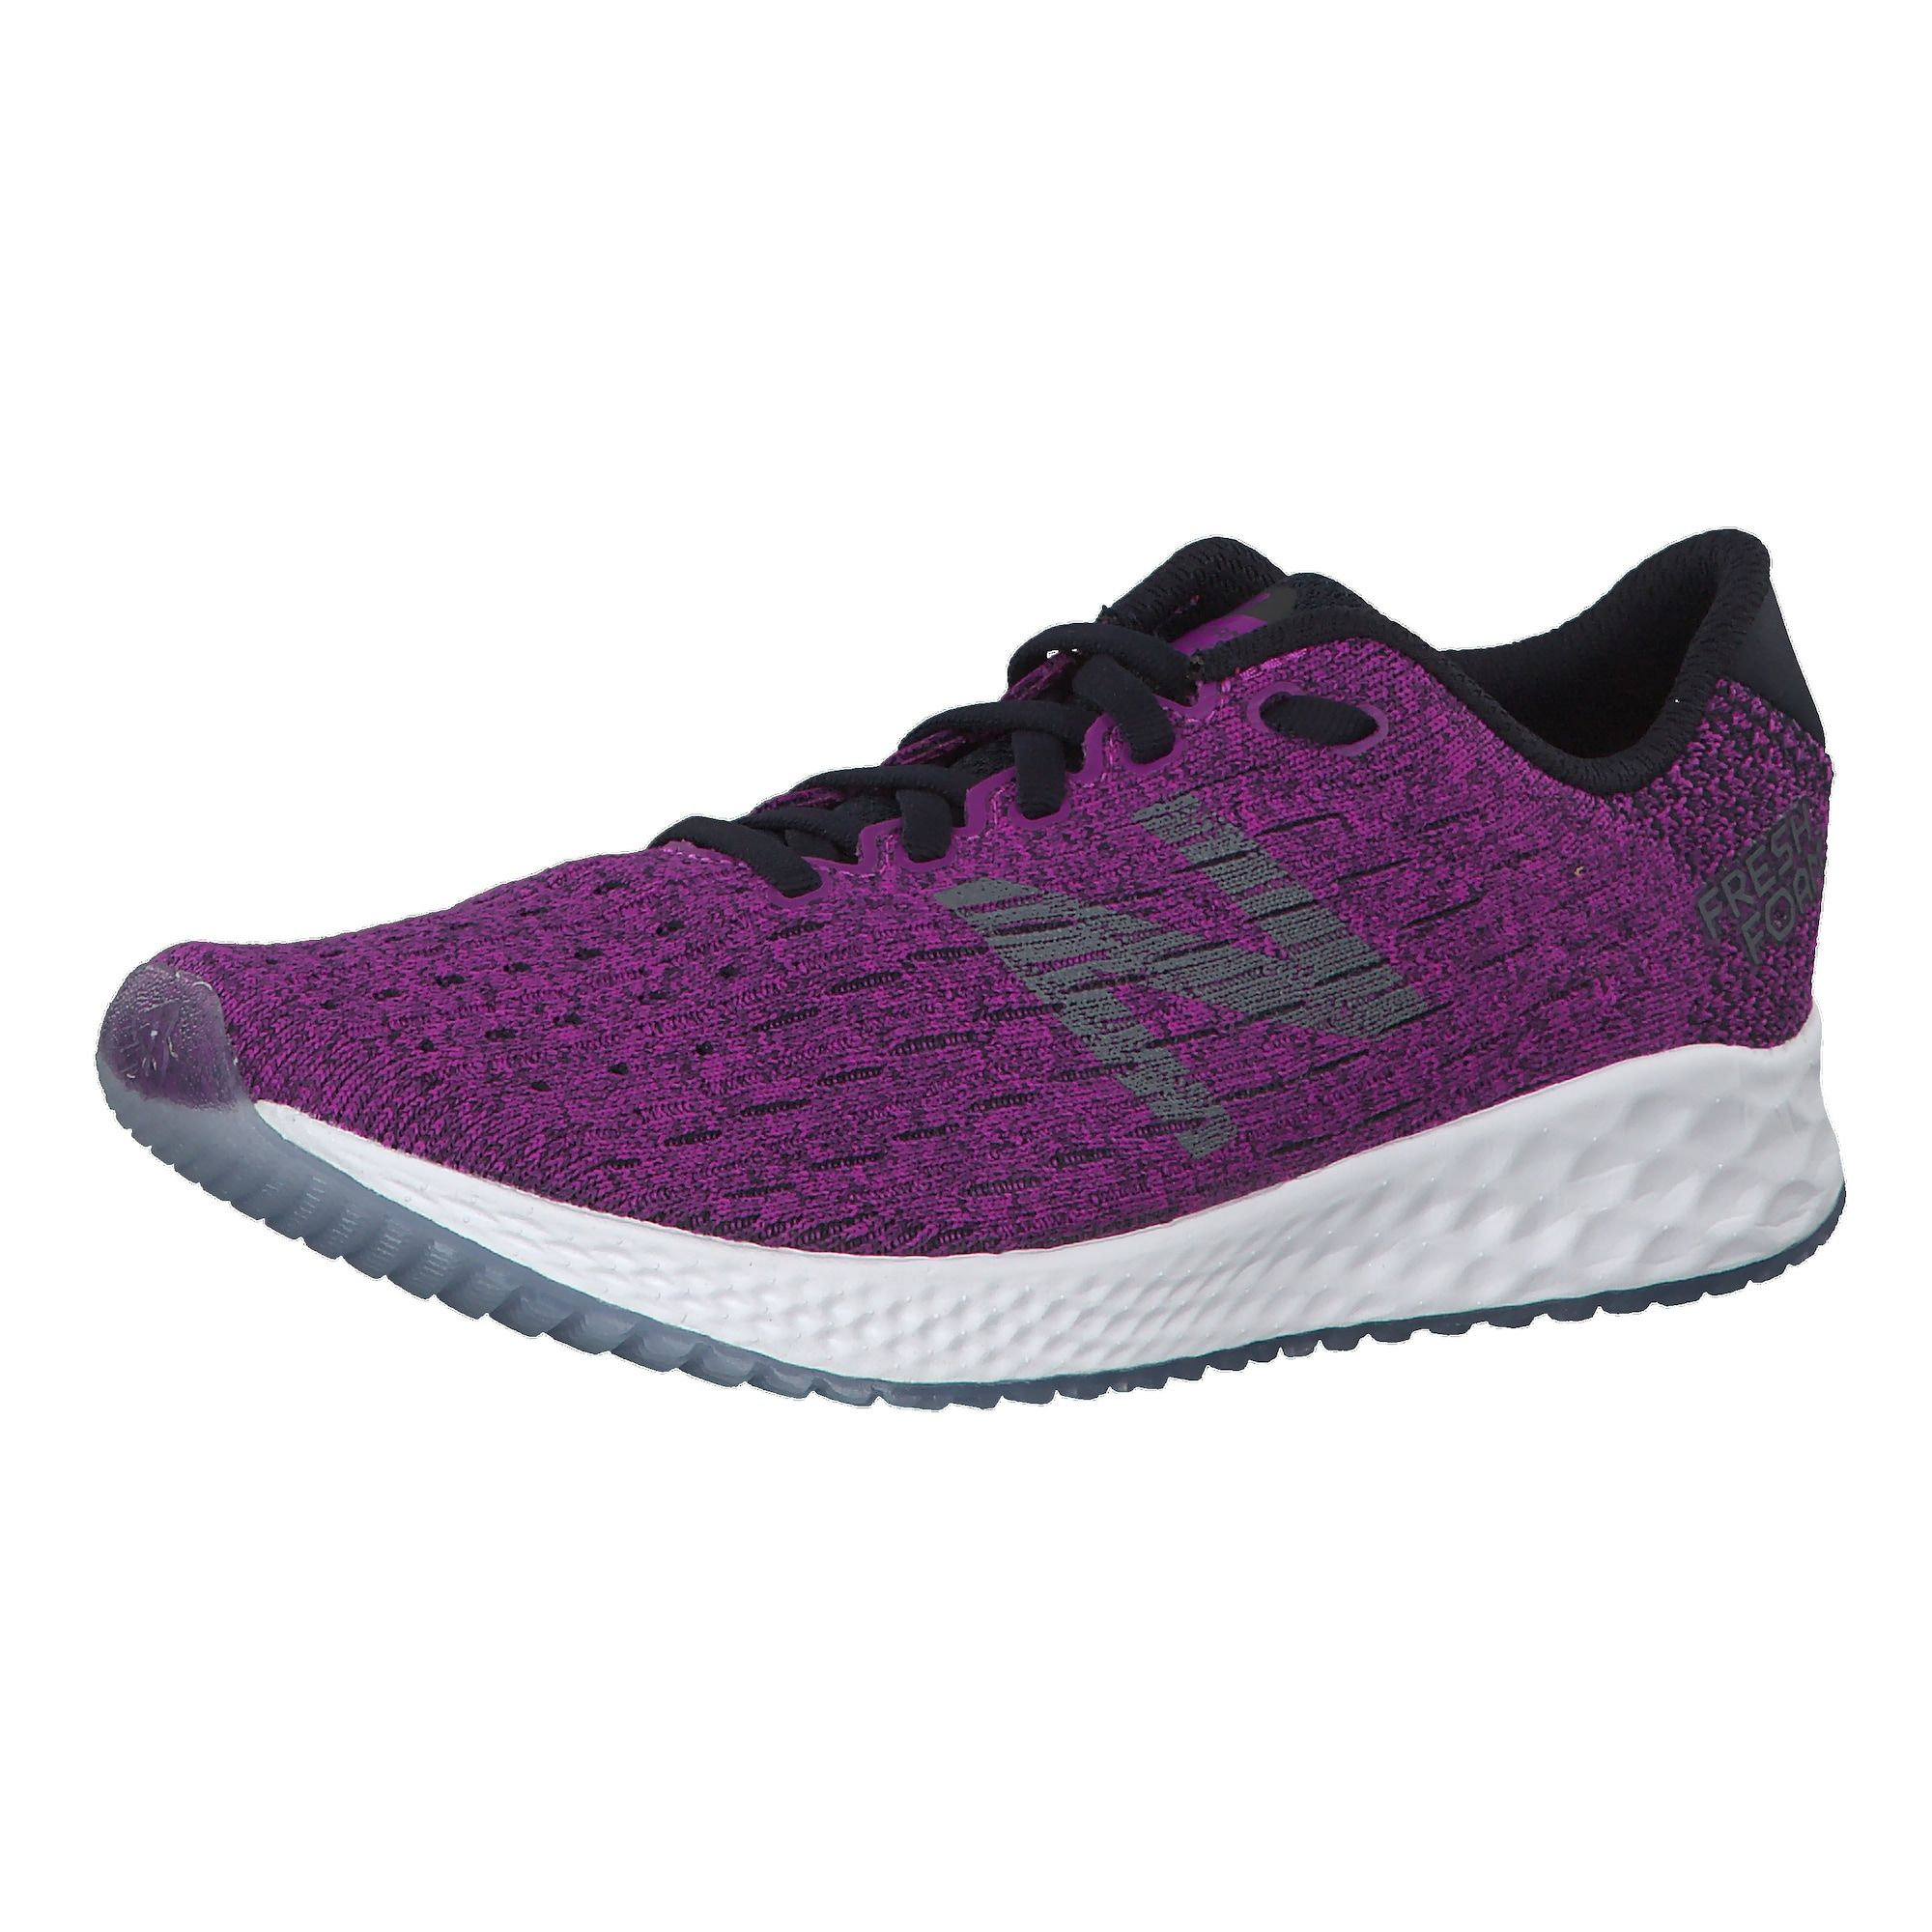 Sport-Schuhe ´Wzanpvv´